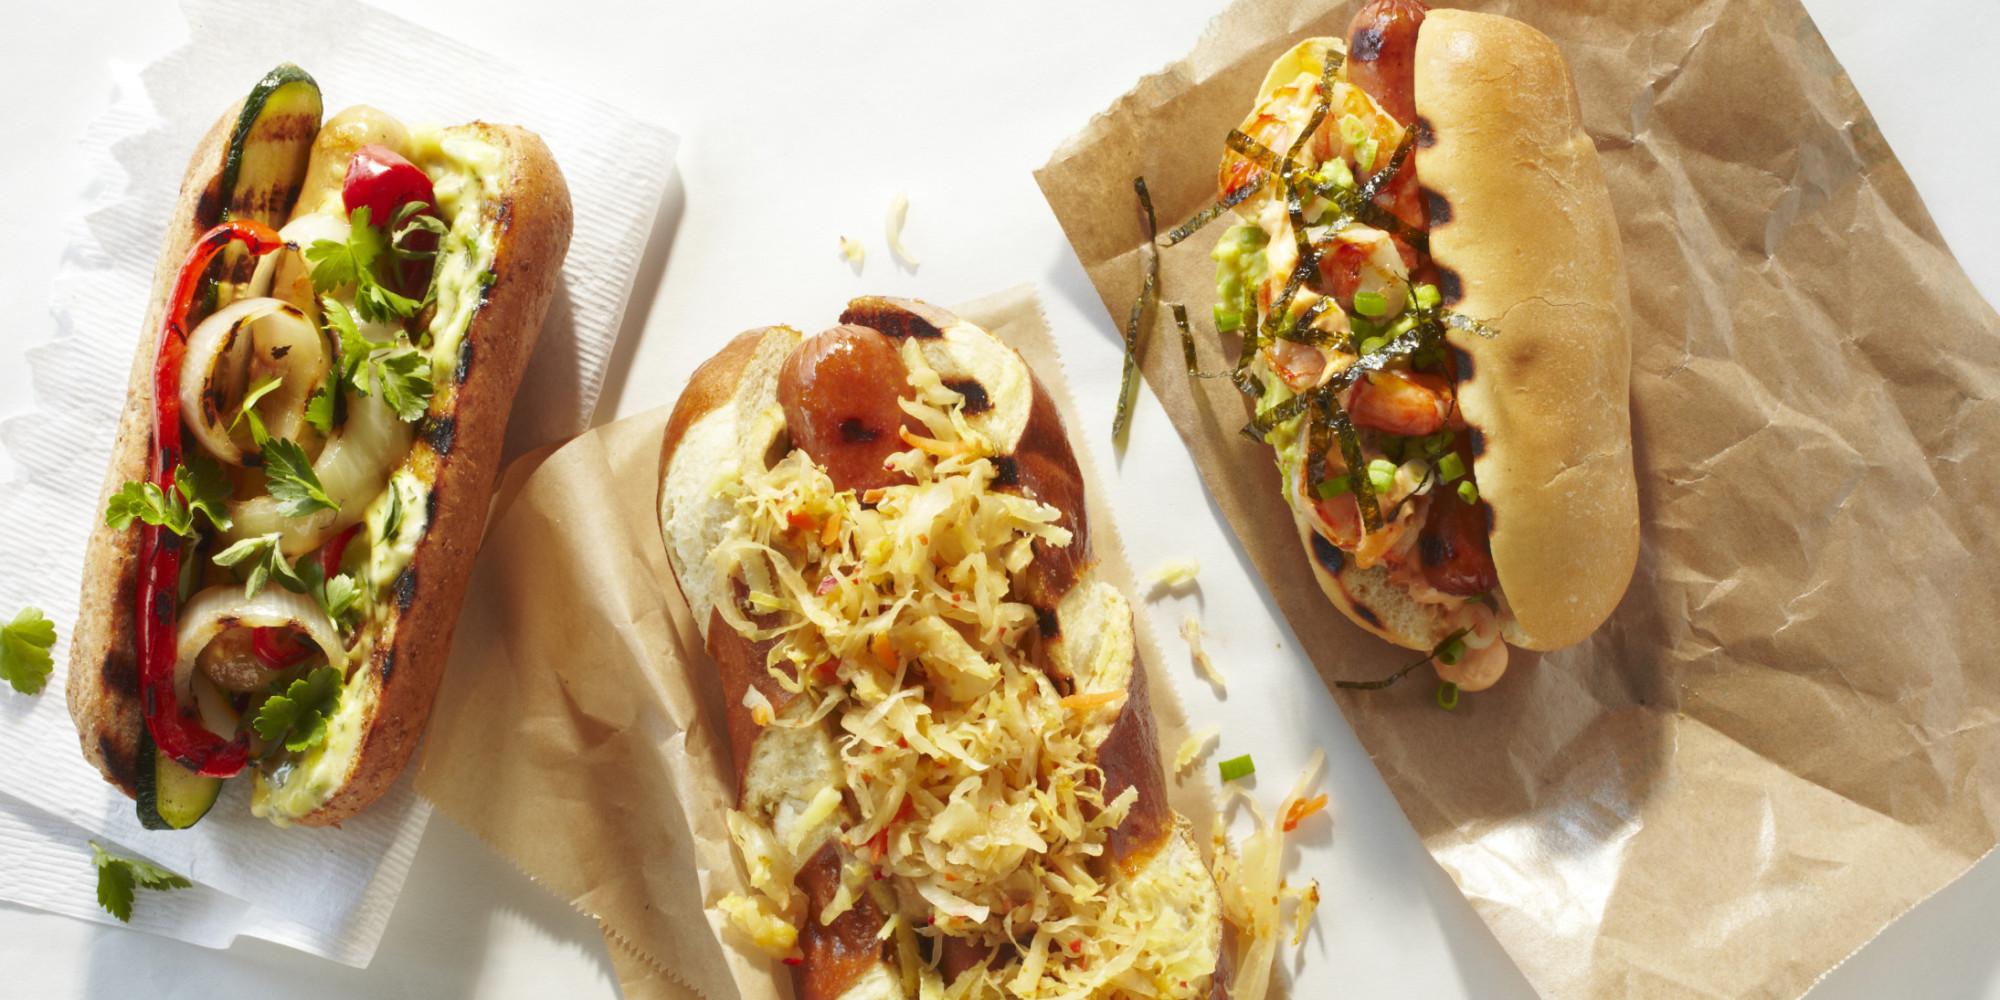 Best Hot Dog Buns Toronto